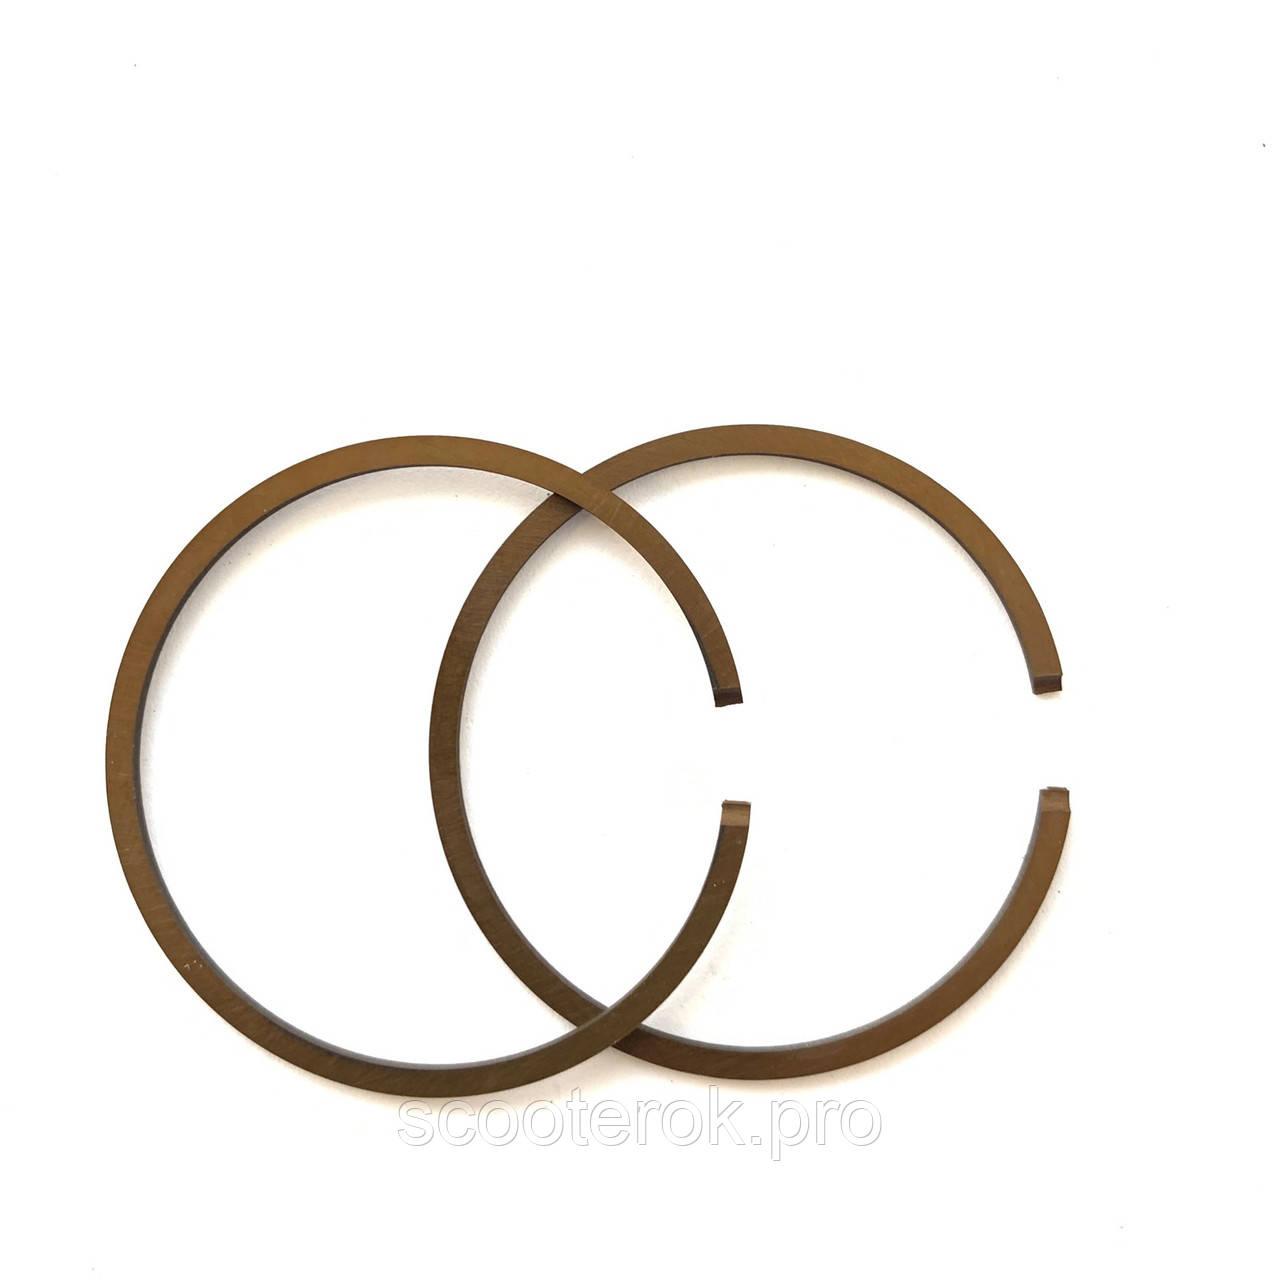 Кільця поршневі діаметр 45мм Goodluck 5200